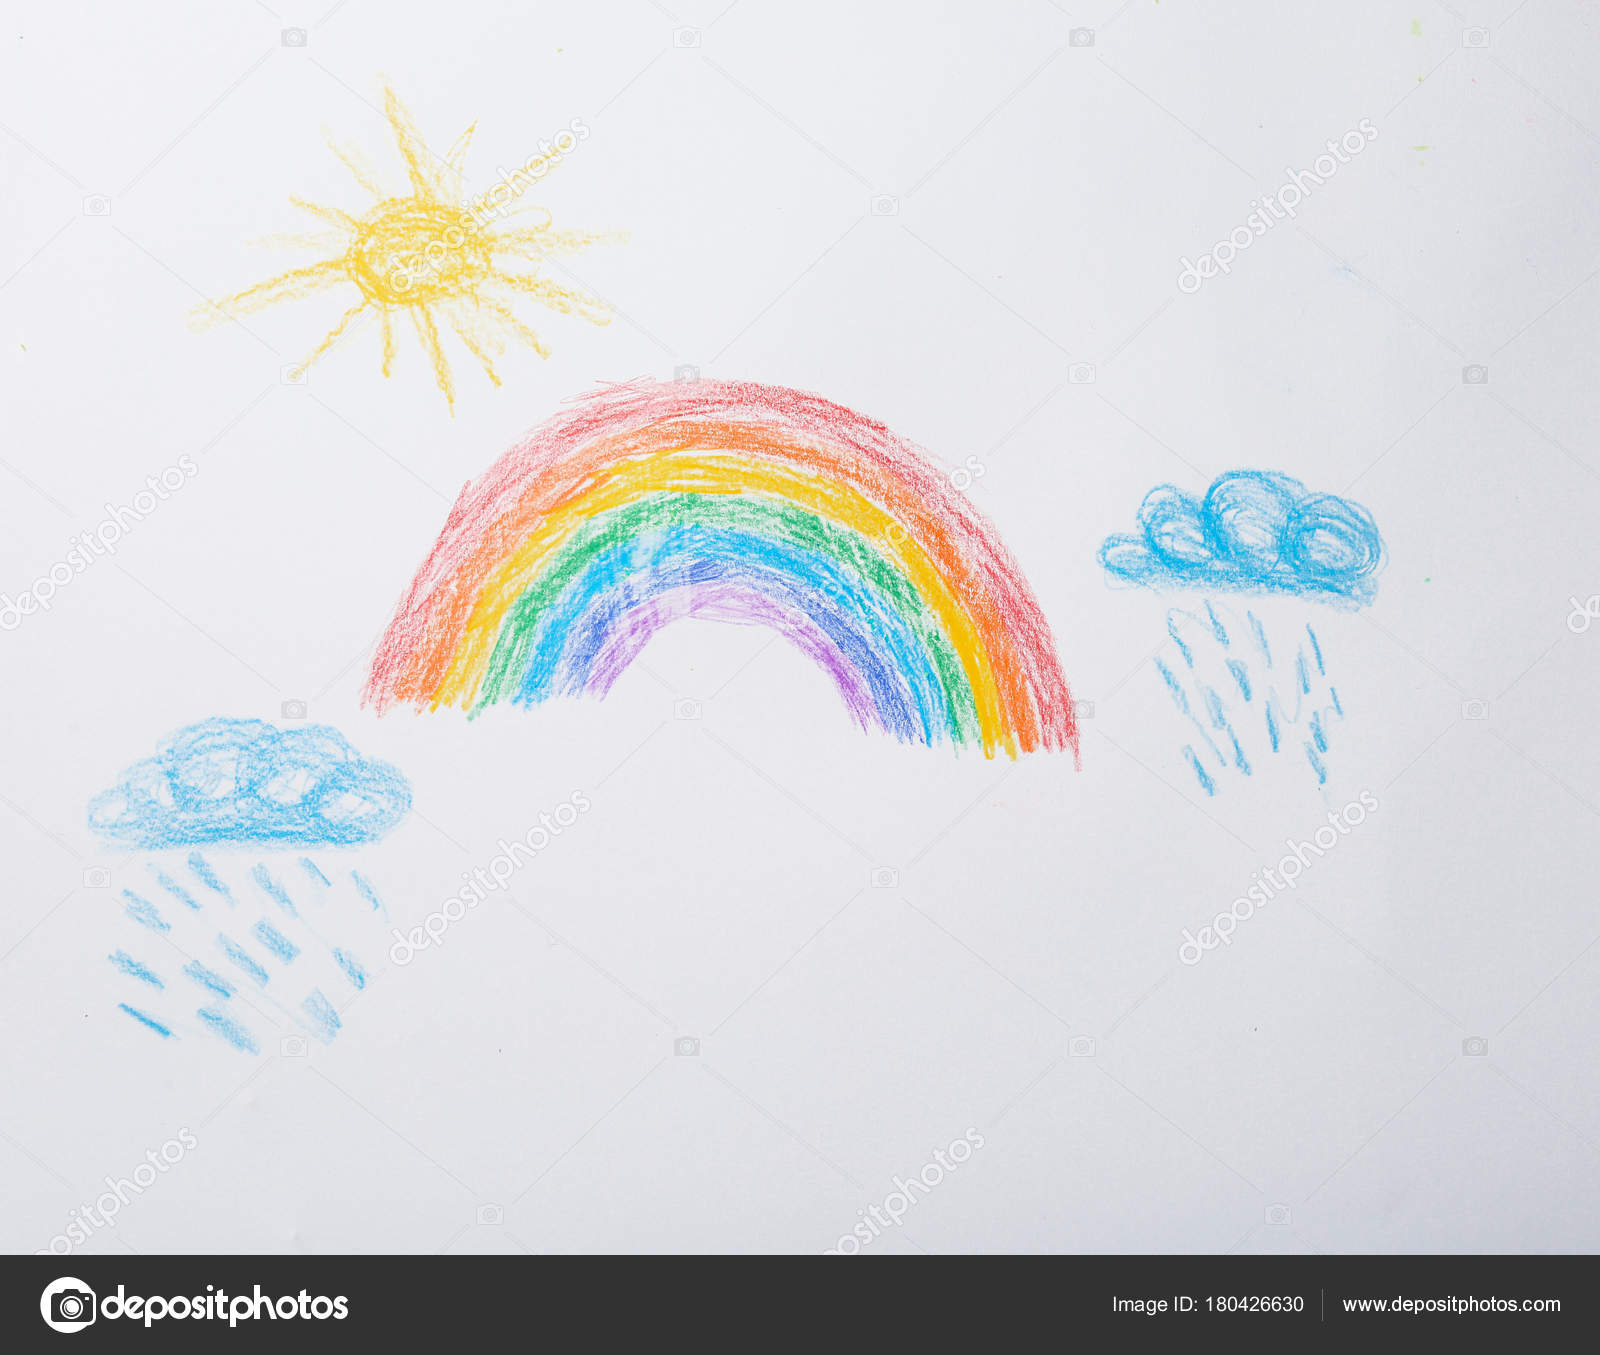 Childish Drawing Sky Rainbow Stock Photo C Belchonock 180426630